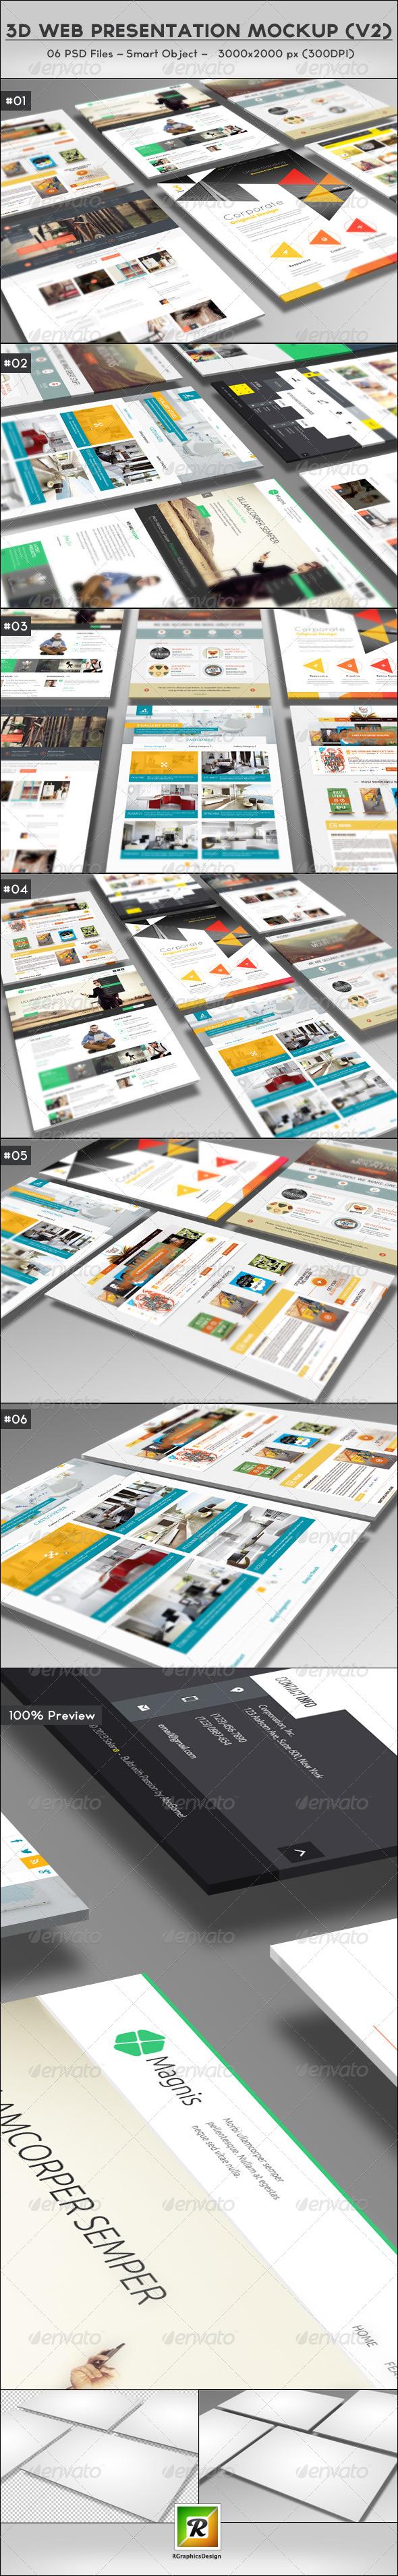 3D Web Presentation Mockup V2